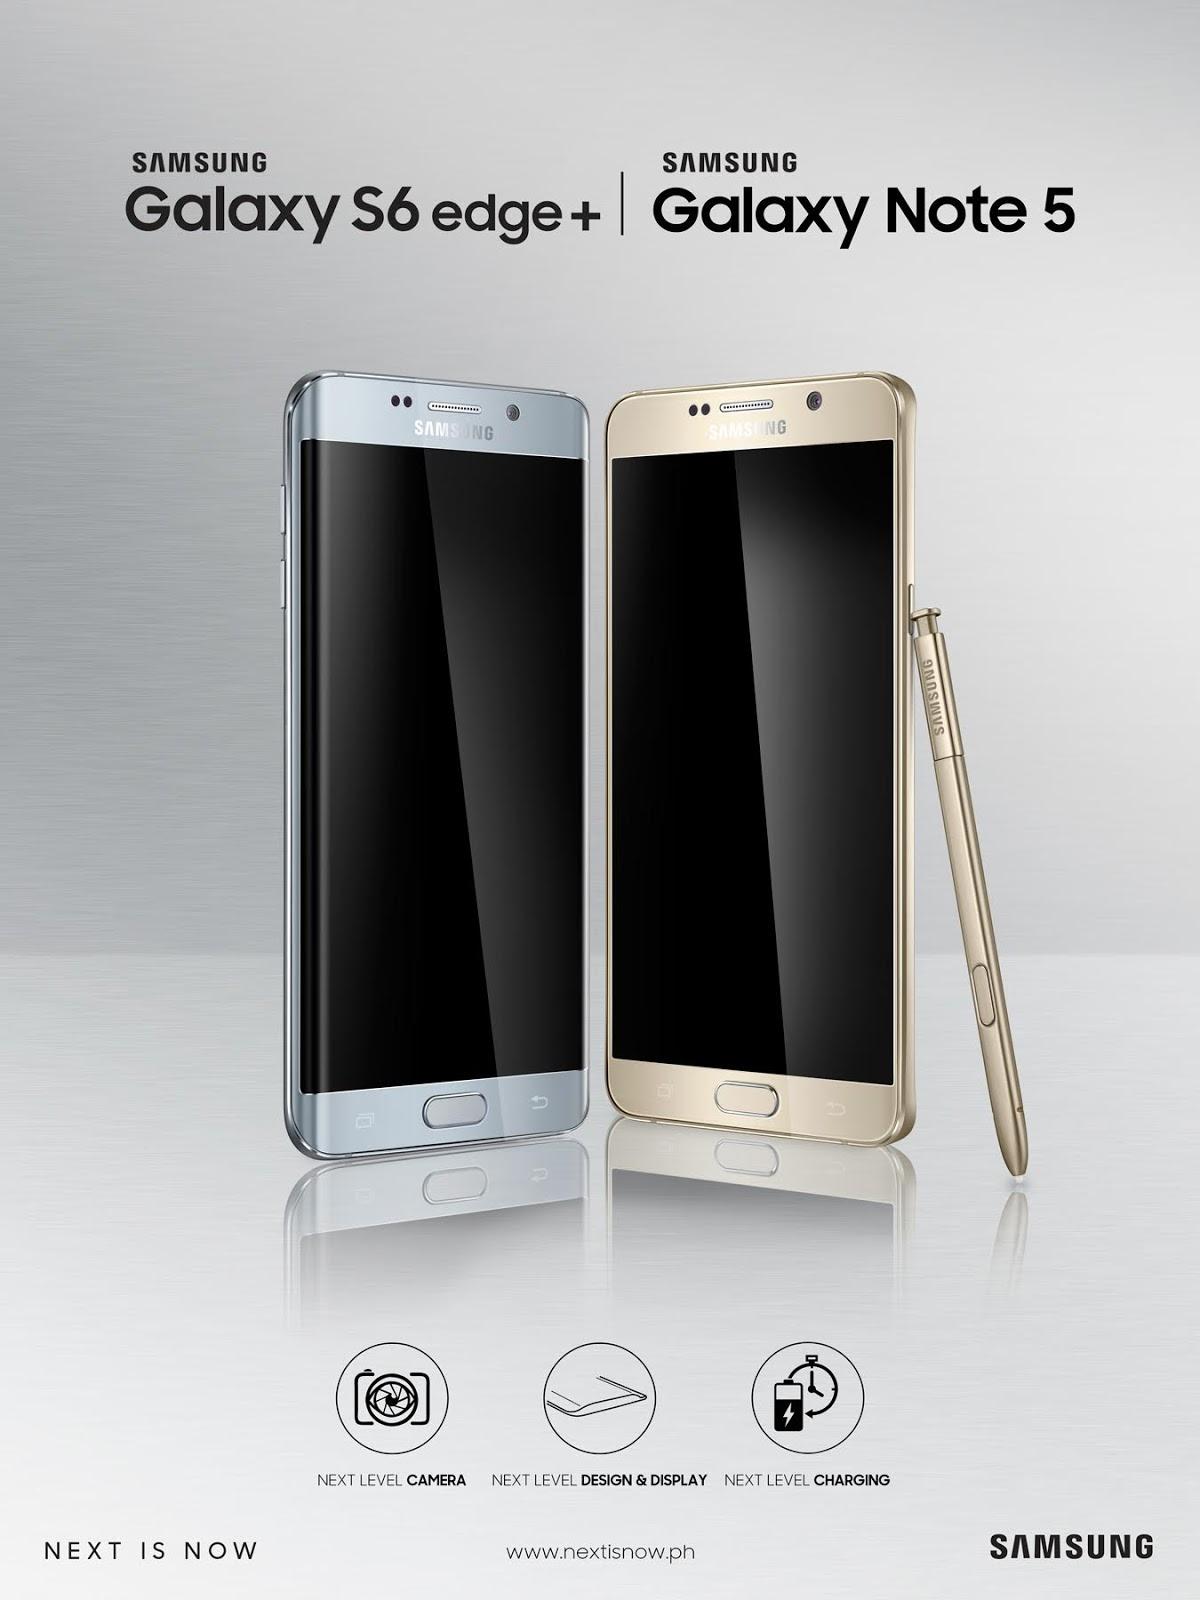 Samsung Galaxy Note5 and Samsung Galaxy S6edge+